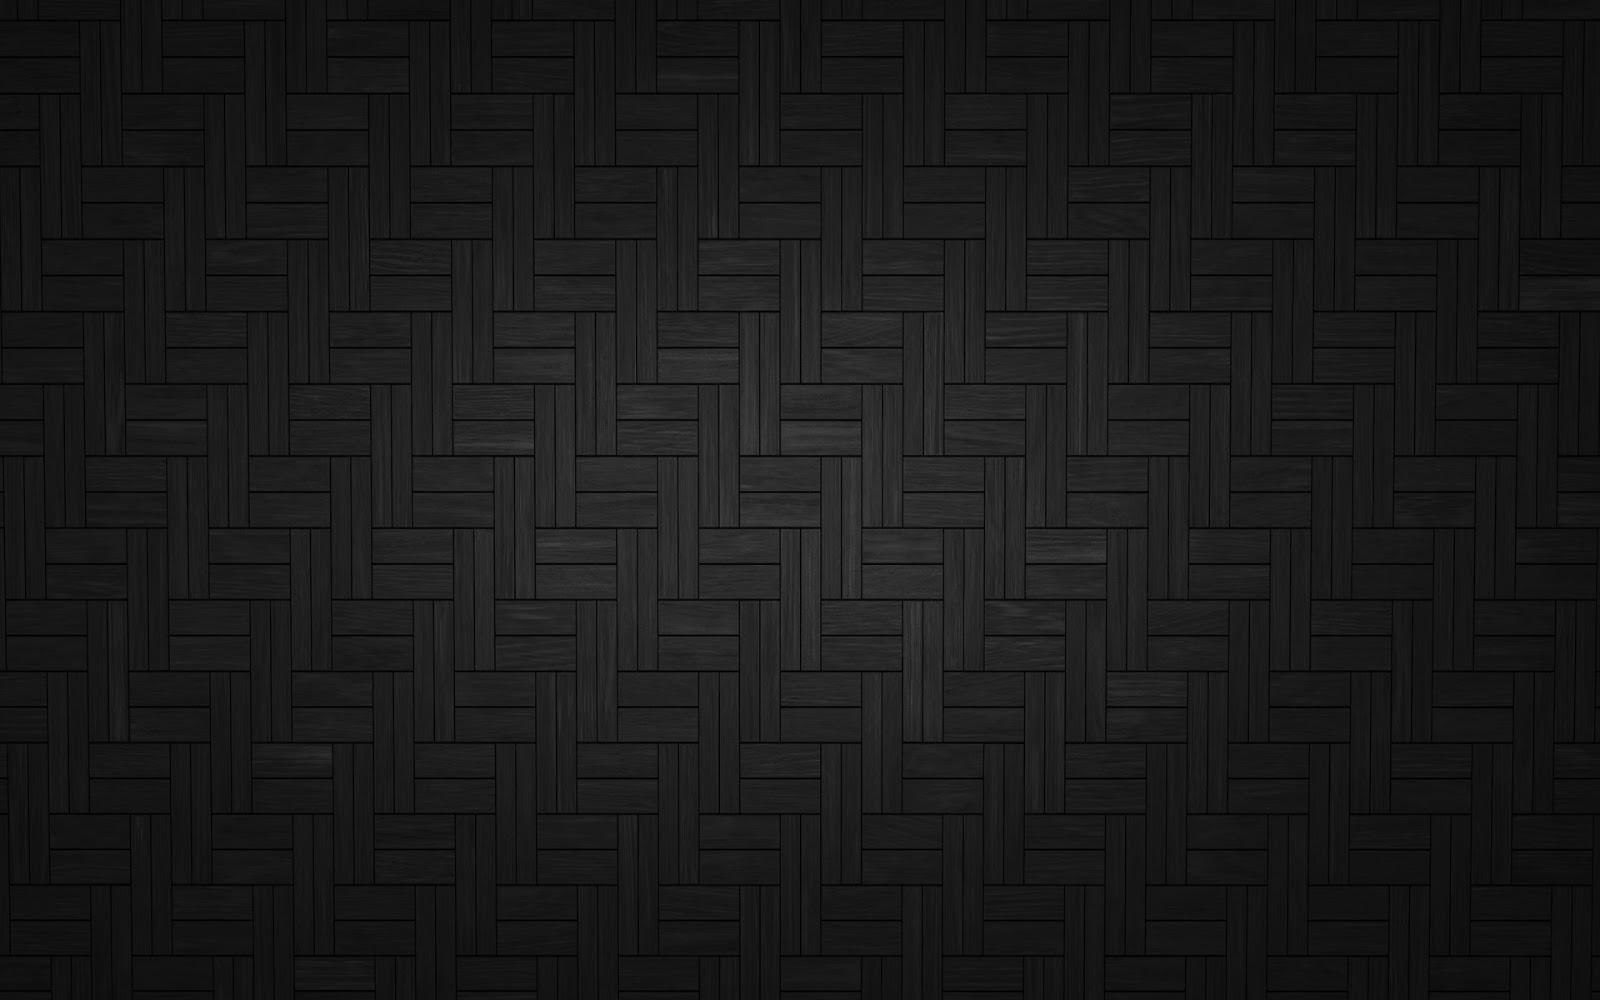 black wallpaper background pc - photo #17